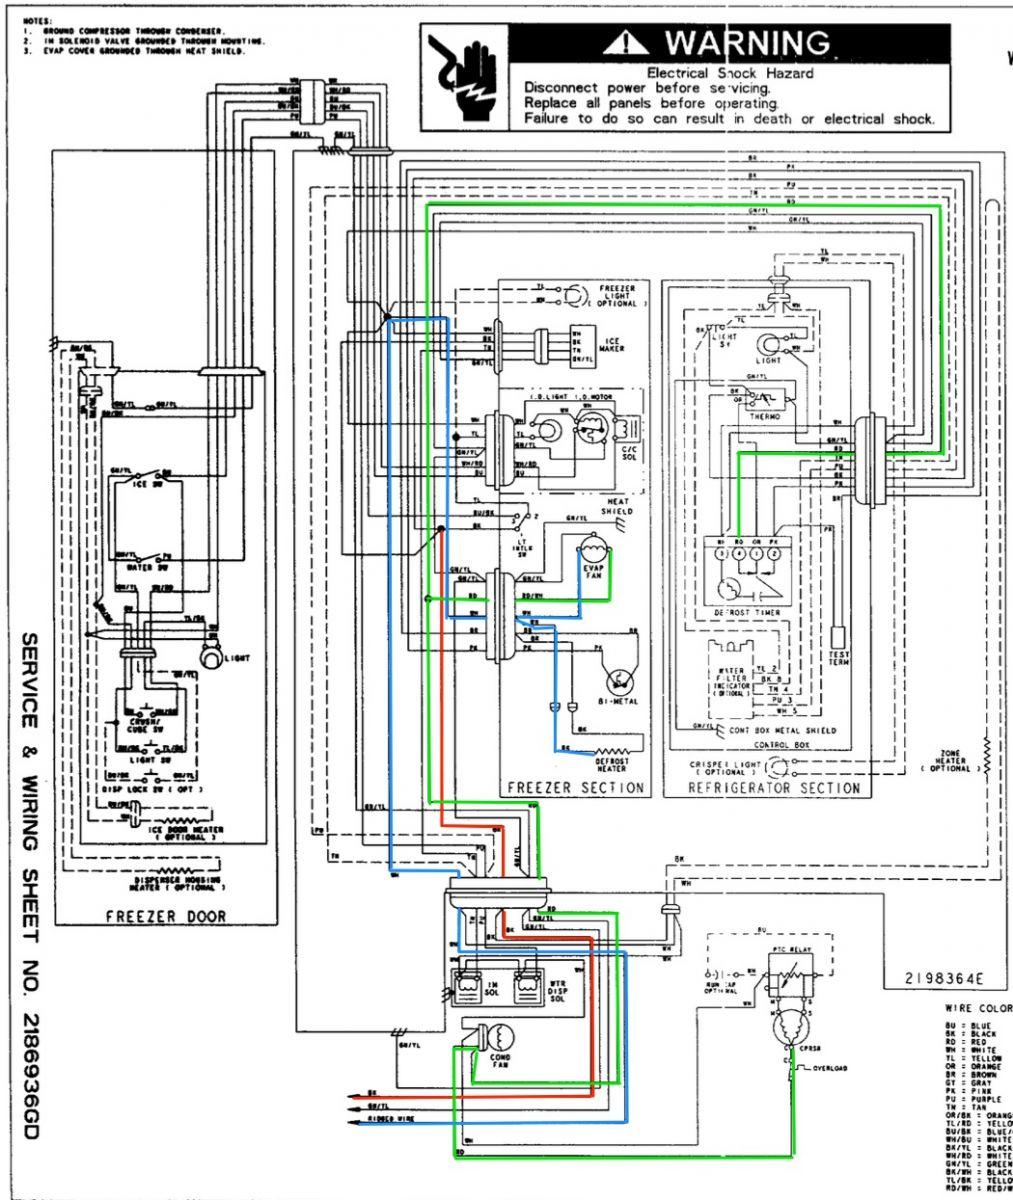 GT_1609] Ge Refrigerator Schematic From Gauche The Poplins Of The Ge Model Schematic  Wiring | Ge Refrigerator Wiring Diagram Problem |  | Norab Wiluq Sequ Xrenket Licuk Mohammedshrine Librar Wiring 101